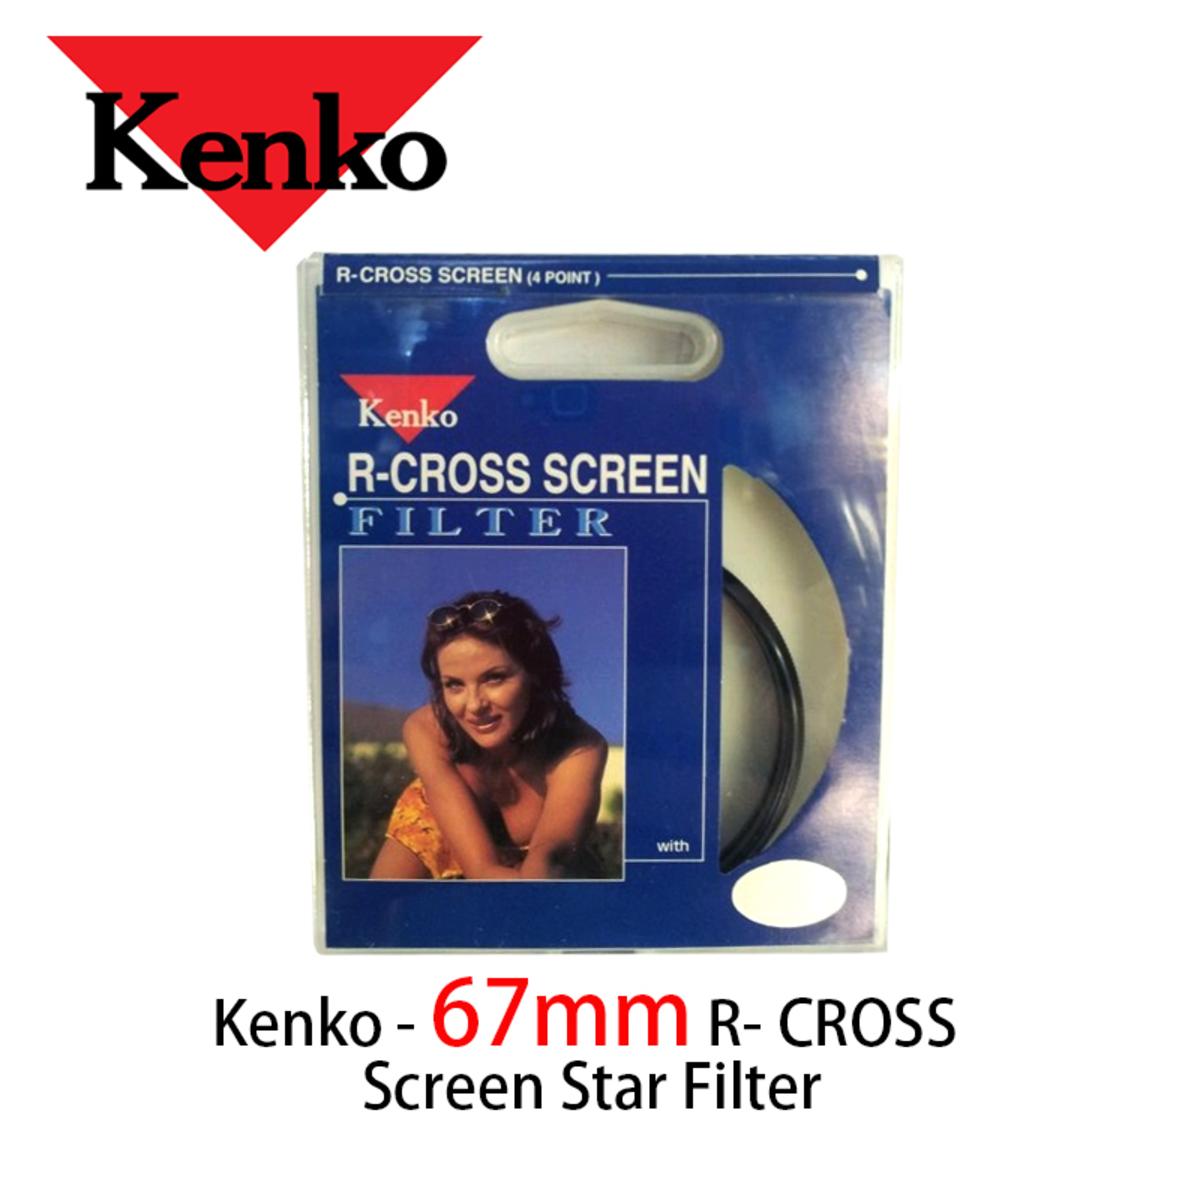 67mm R- CROSS Screen Star Filter 可調十字星光鏡